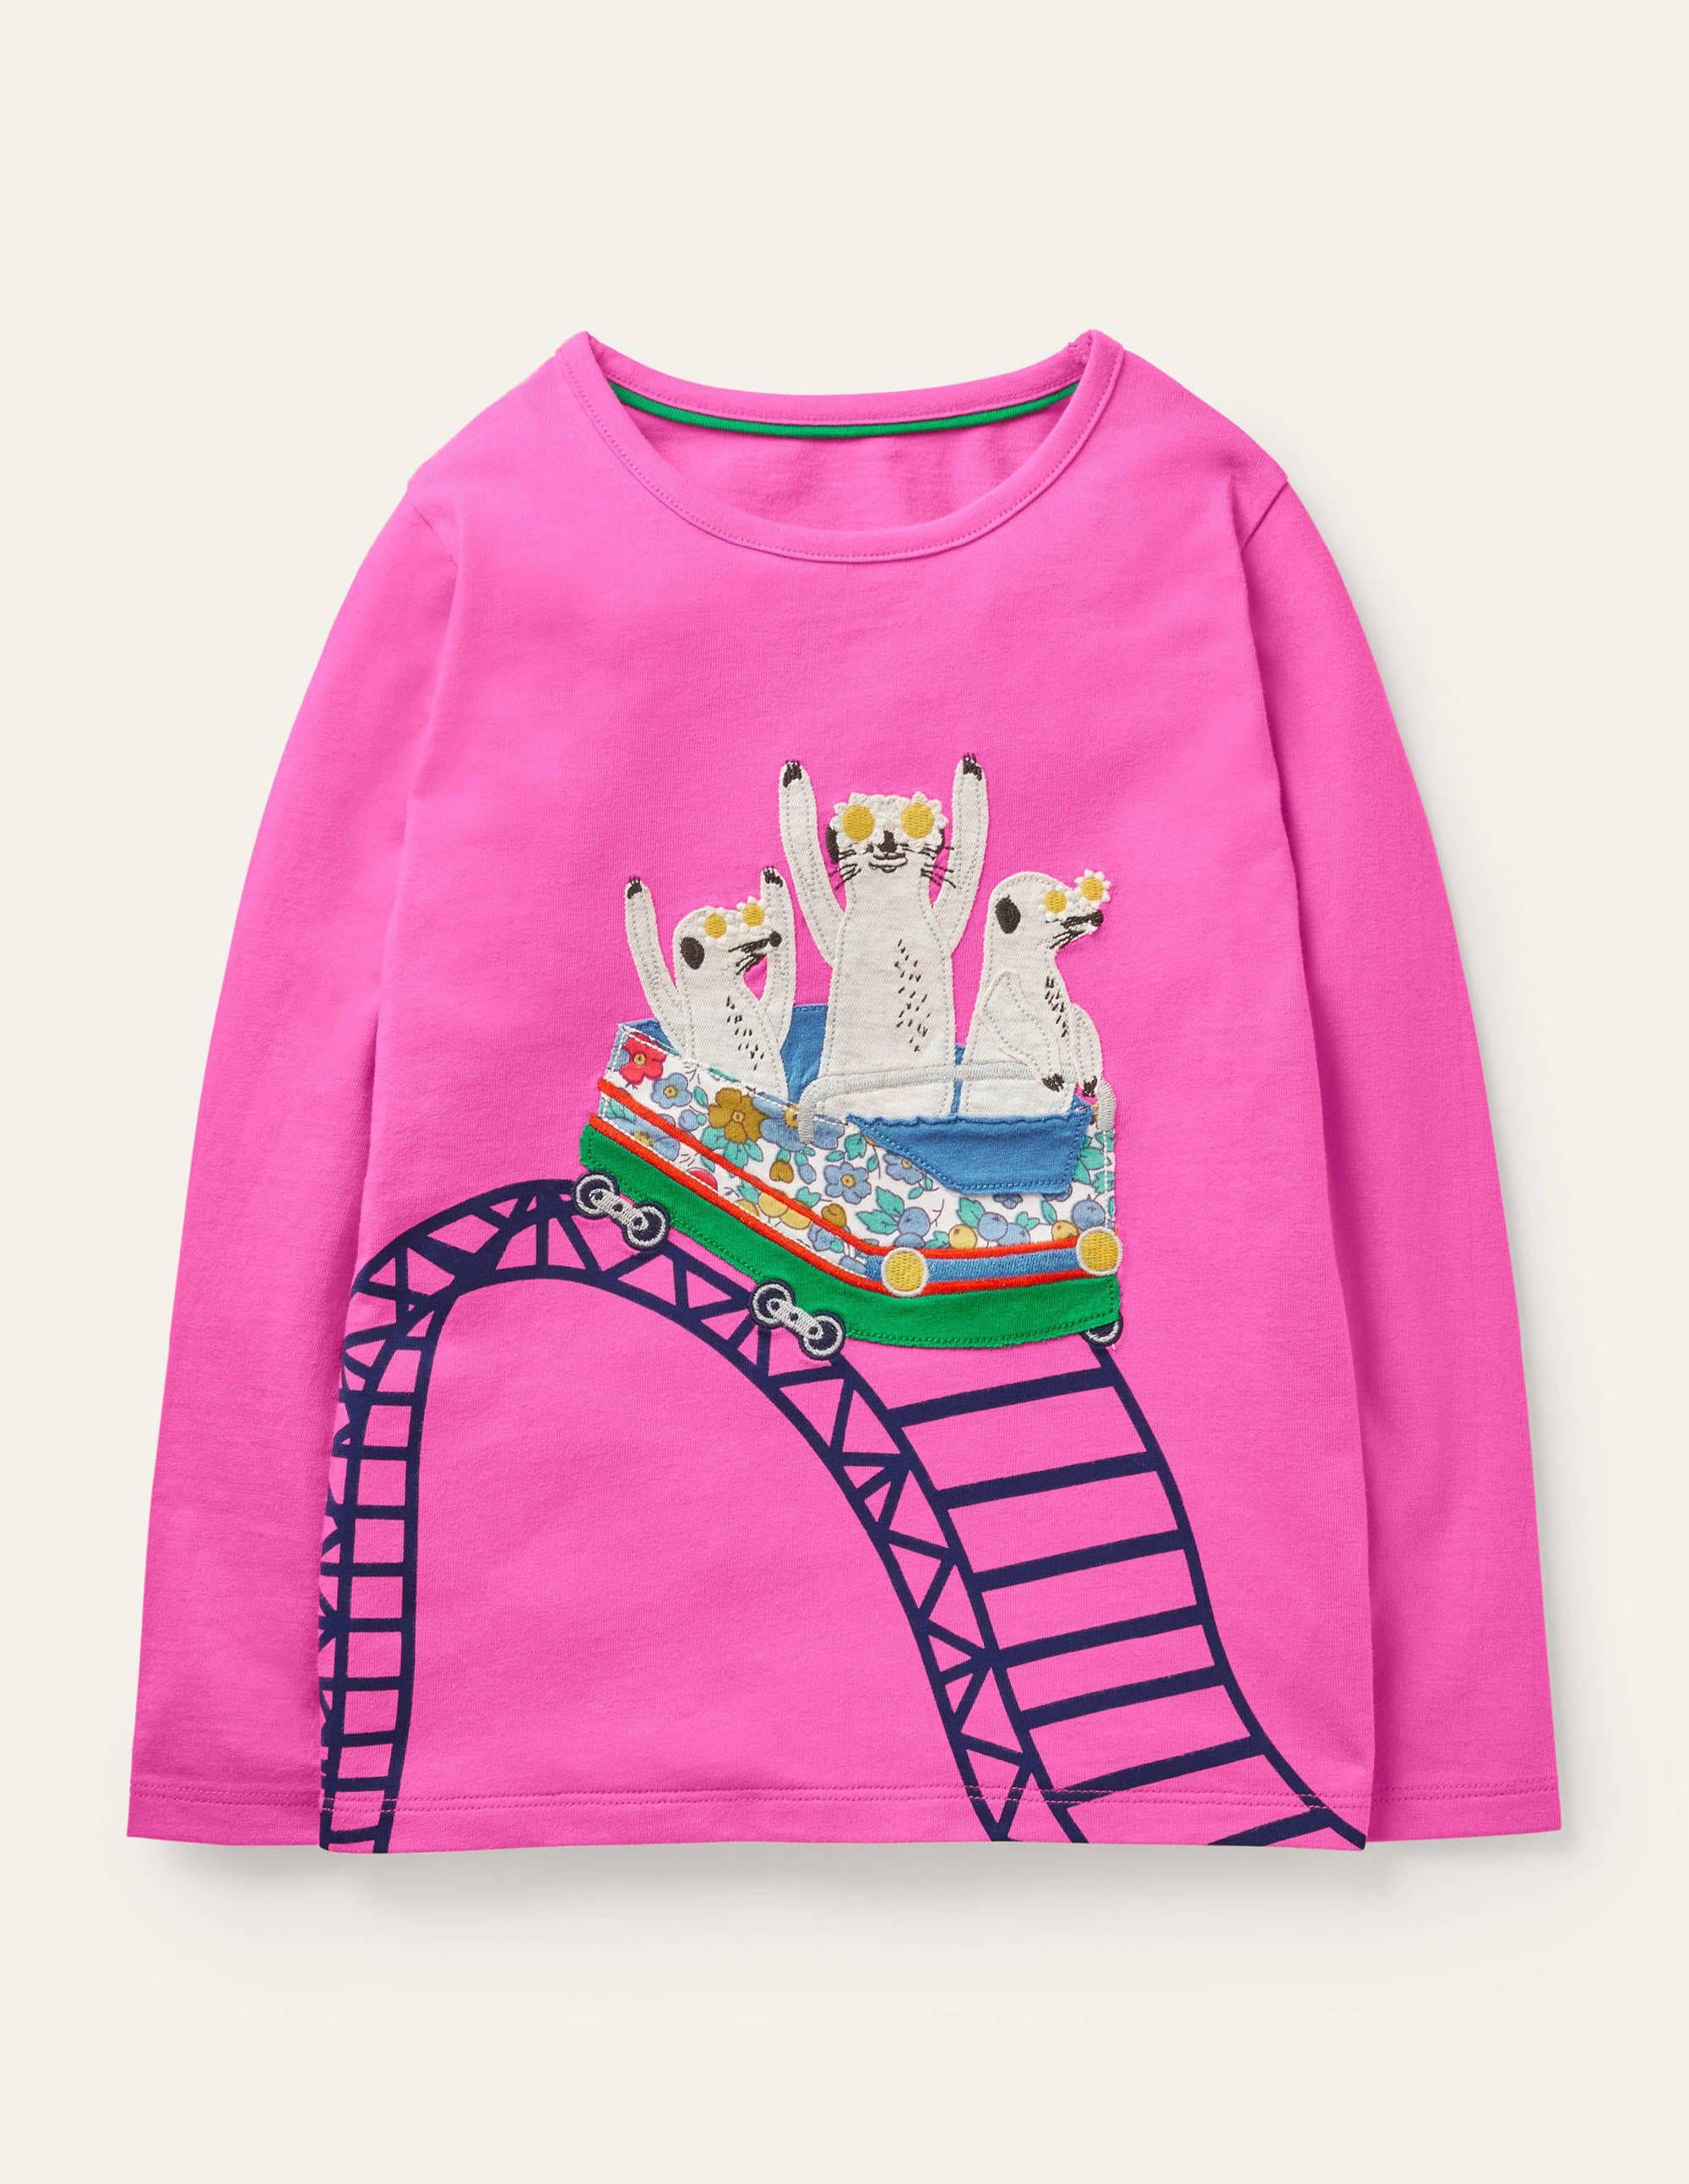 Boden Front & Back T-shirt - Tickled Pink Meerkats